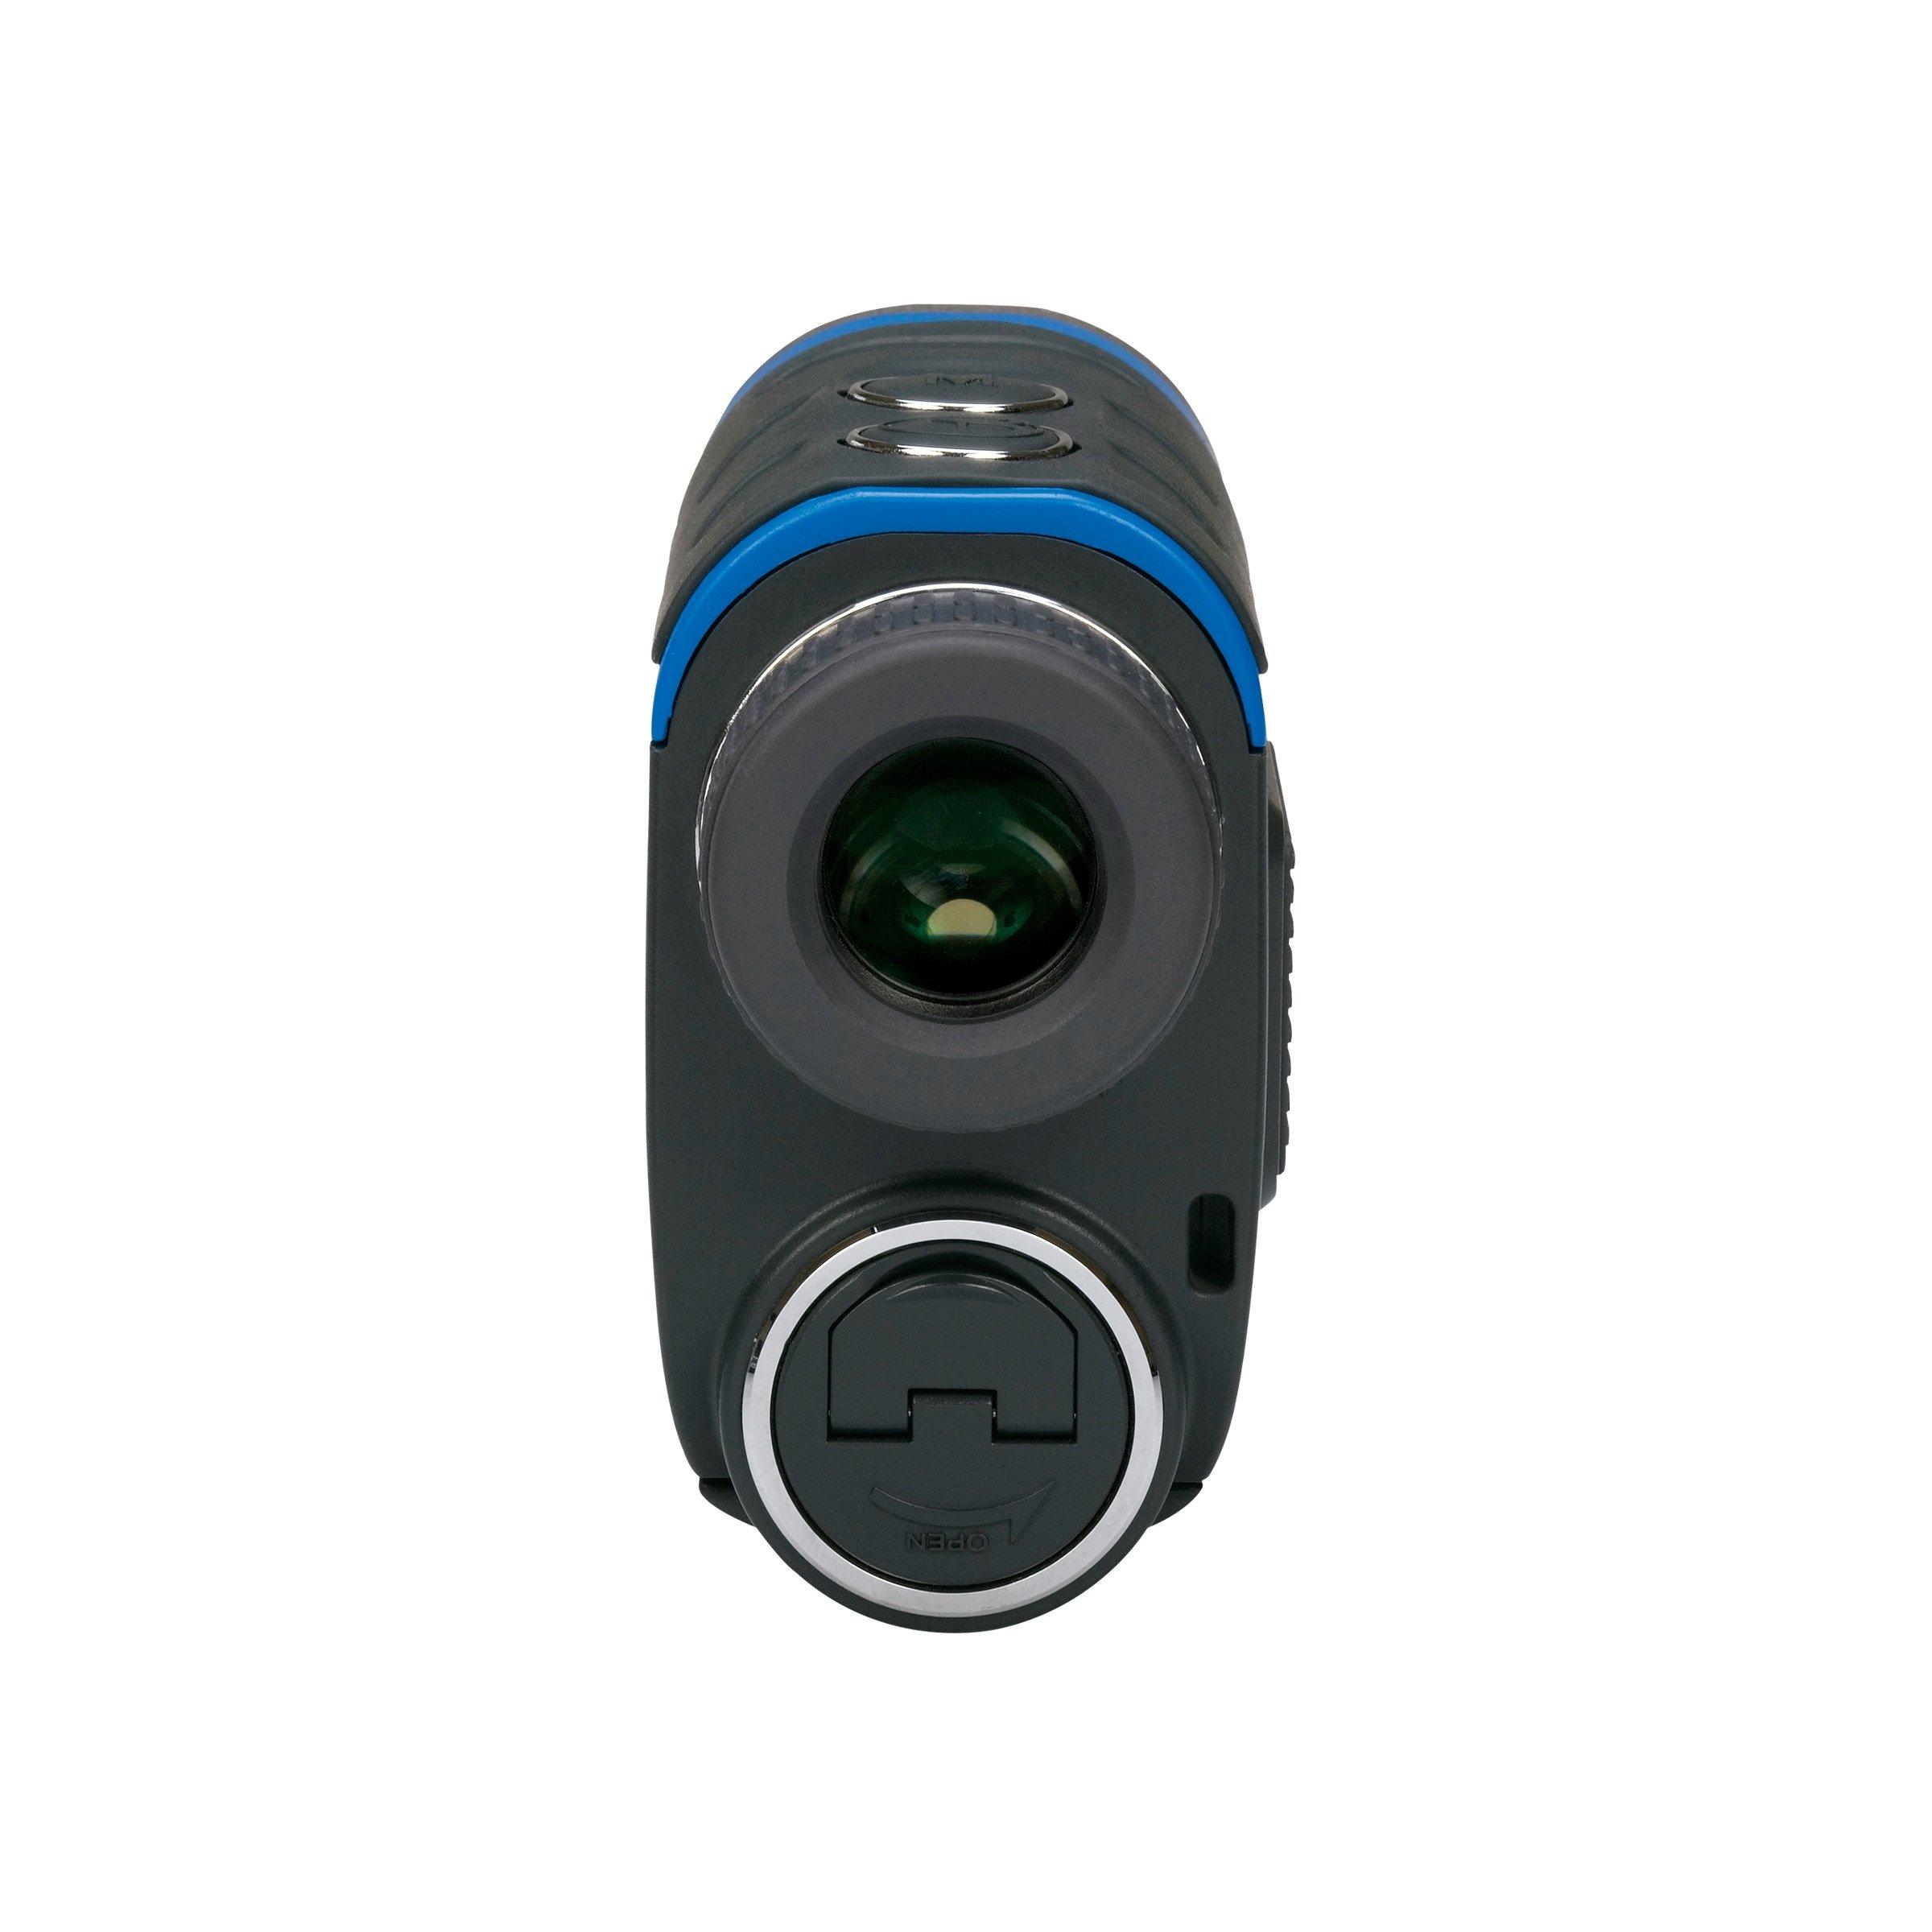 GolfBuddy LR5S Golf Laser Rangefinder with Slope, Dark Gray/Blue by GolfBuddy (Image #6)